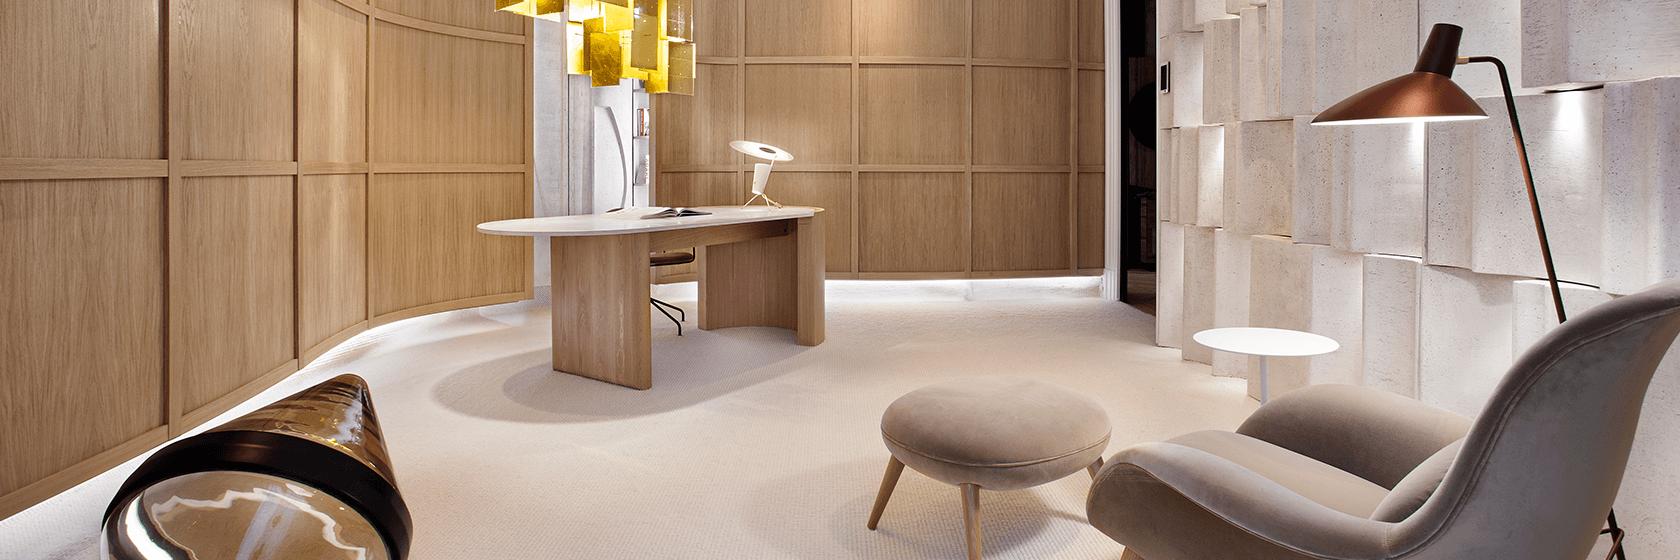 Casa Decor 2021: Modern Times | The Room Studio